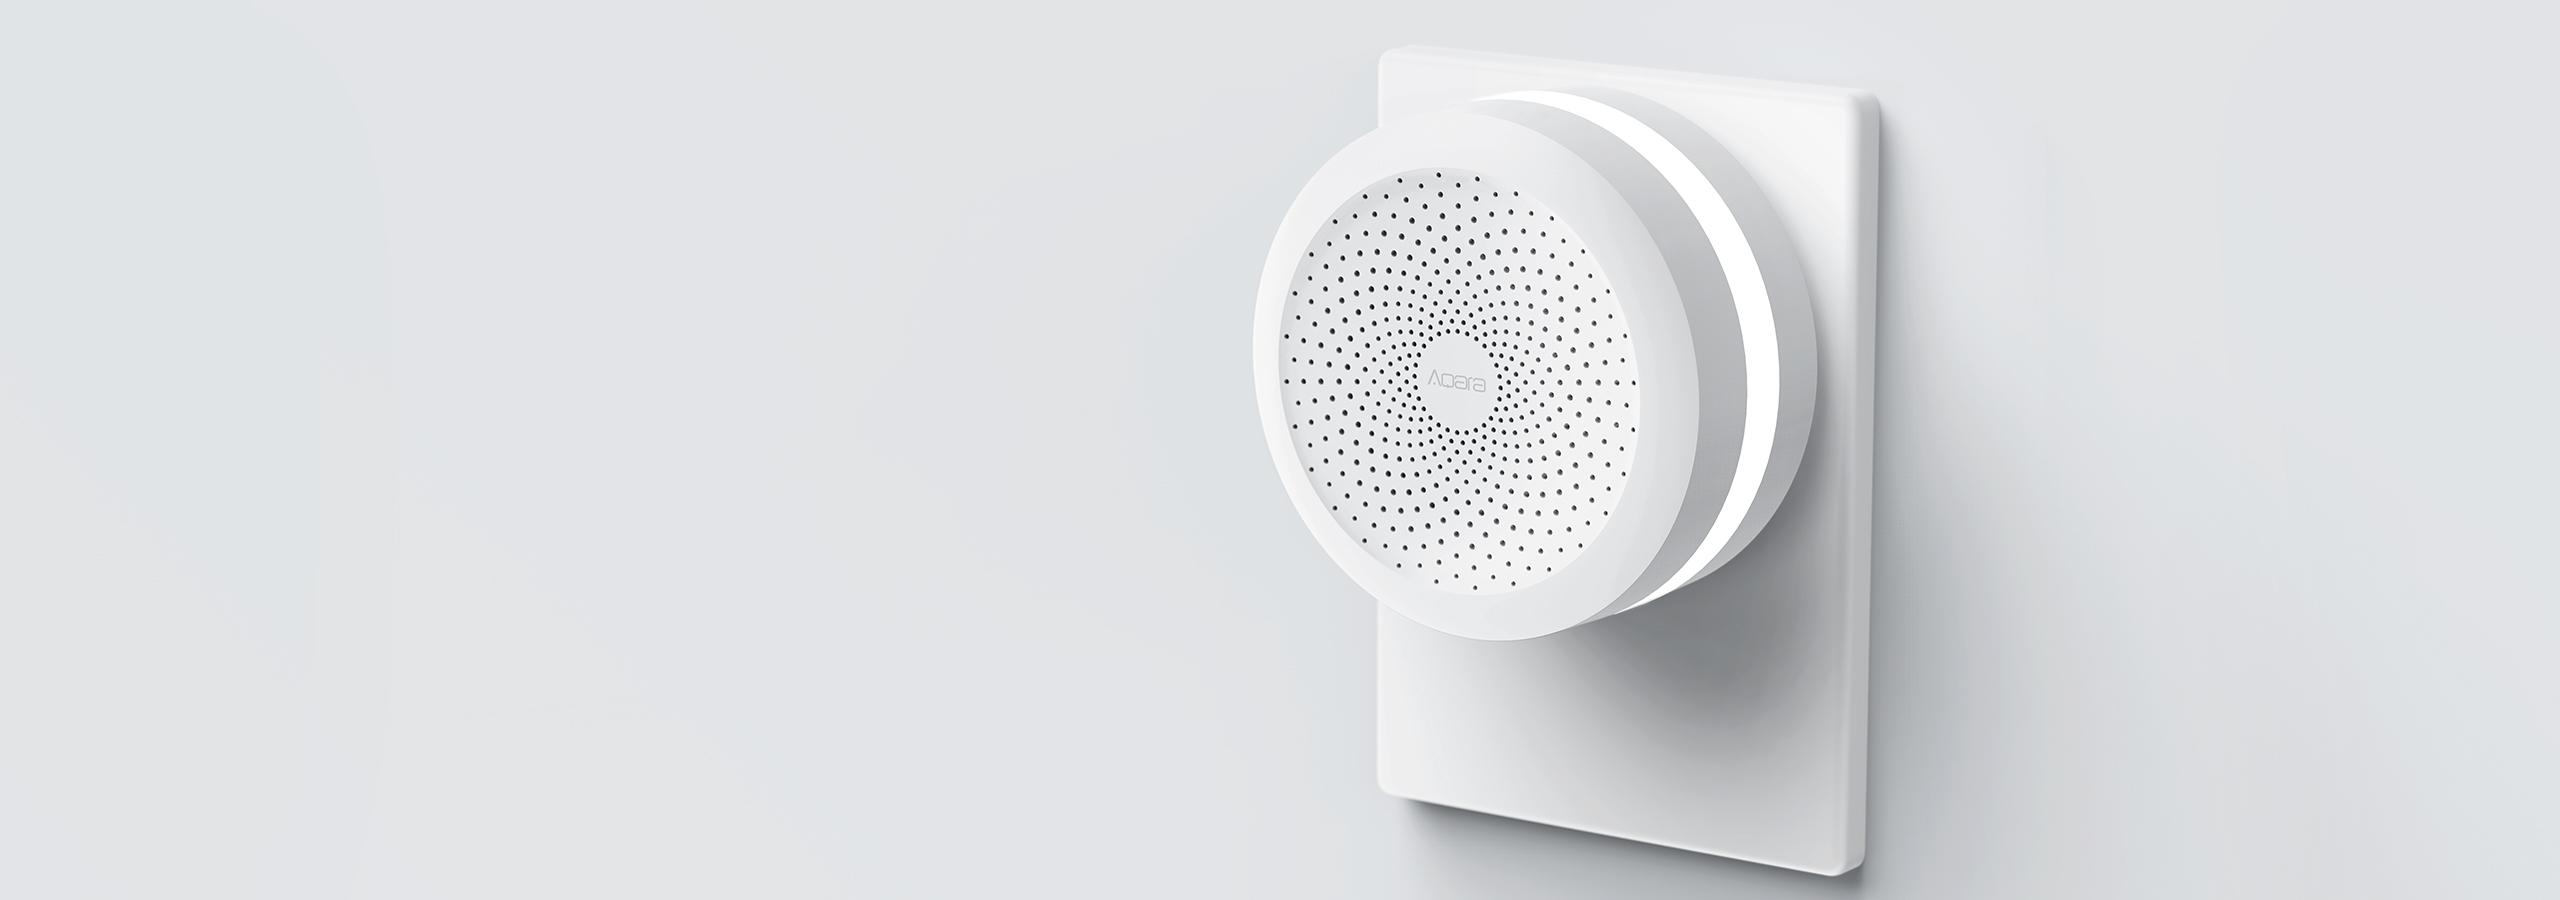 Aqara zigbee smart home hub - works with HomeKit, Google Assistant and Amazon Alexa